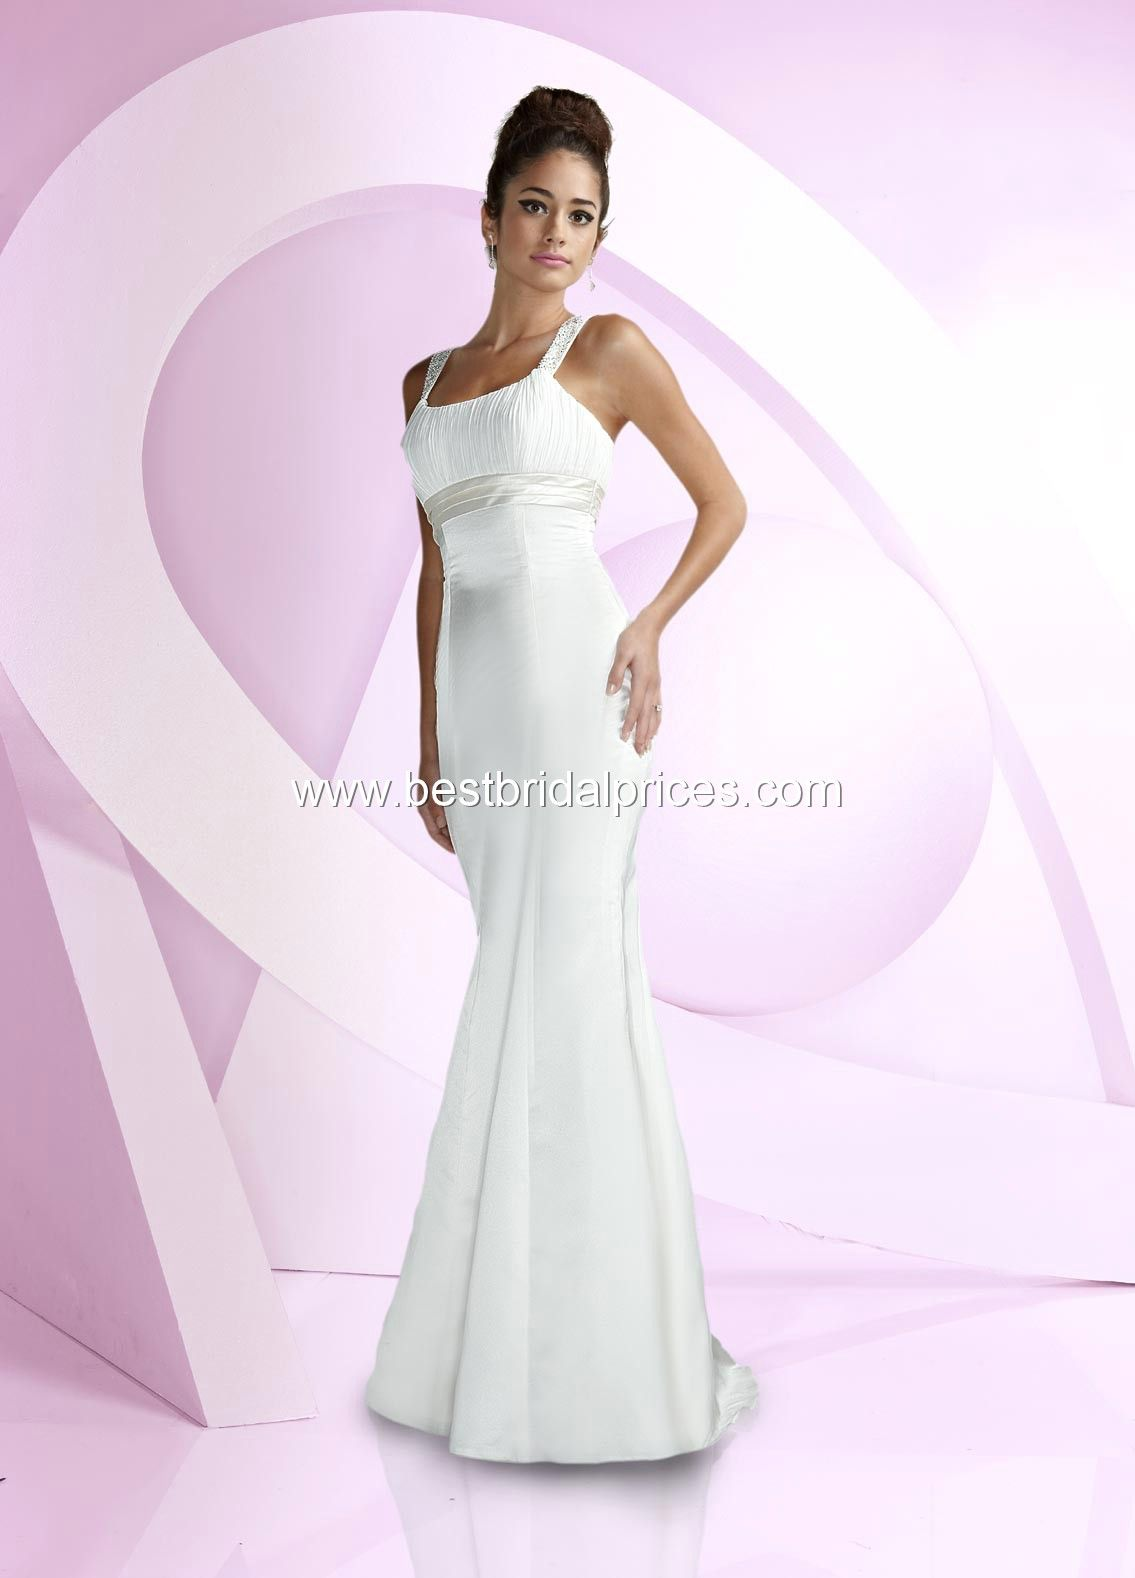 Pin by gina ingram on my style pinterest destiny wedding dress